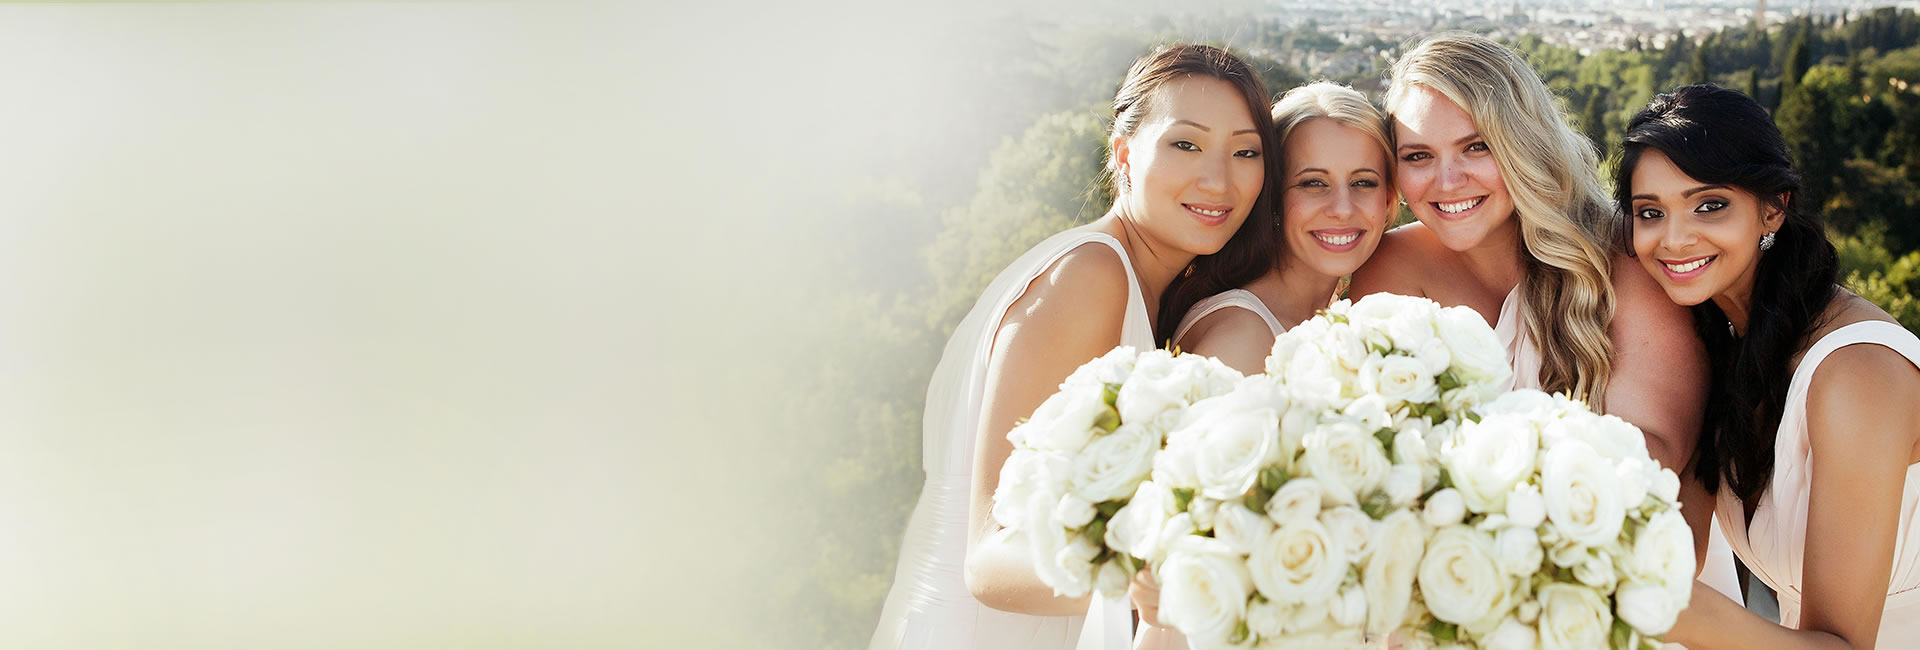 Alterations Express Bridal Services